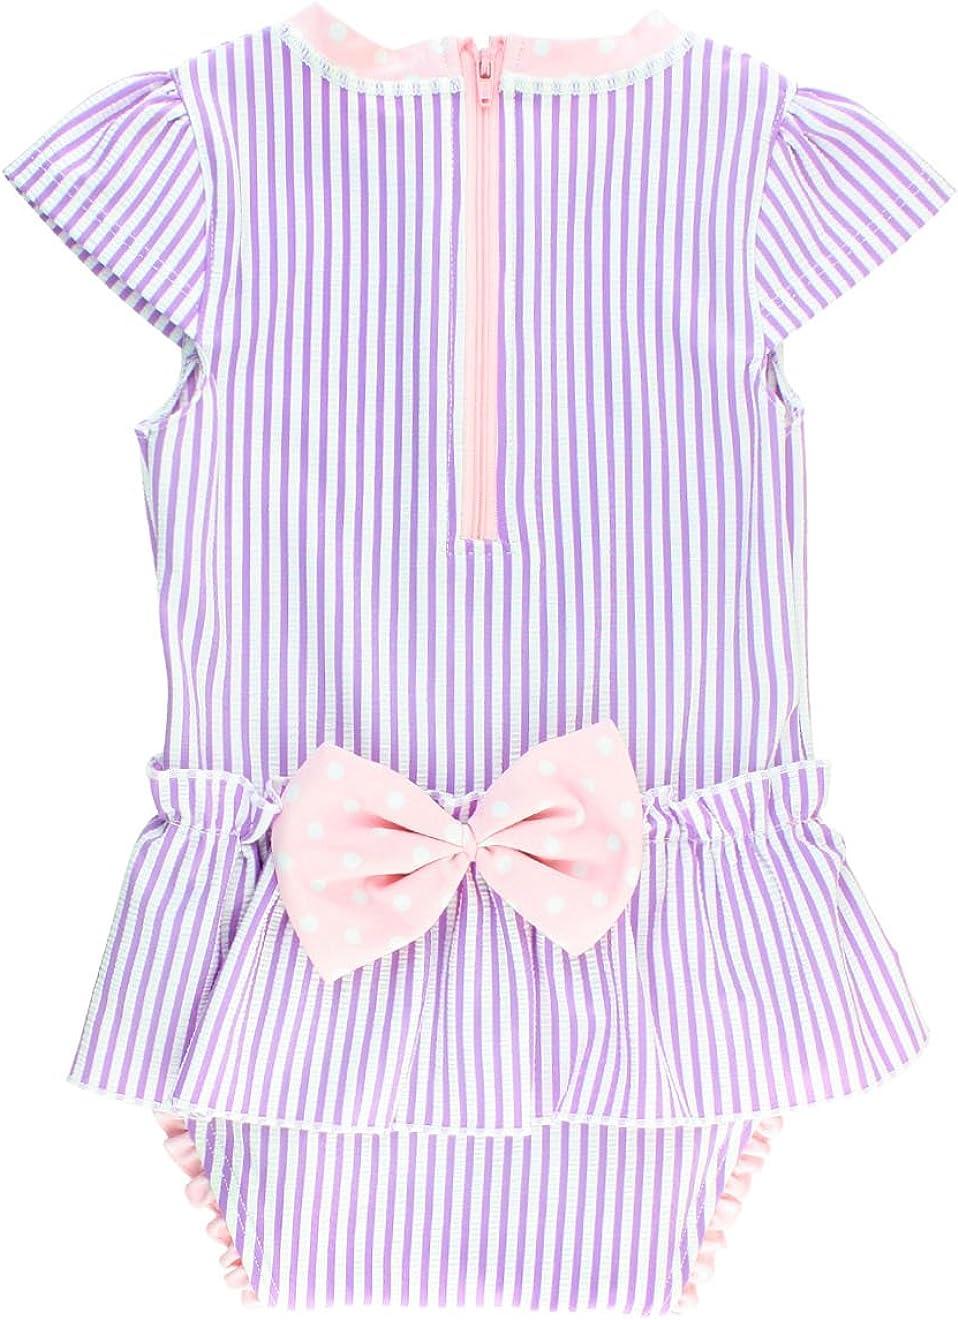 RuffleButts Infant/Toddler Girls Peplum Short Sleeve One Piece Swimsuit UPF 50+ Sun Protection: Clothing, Shoes & Jewelry